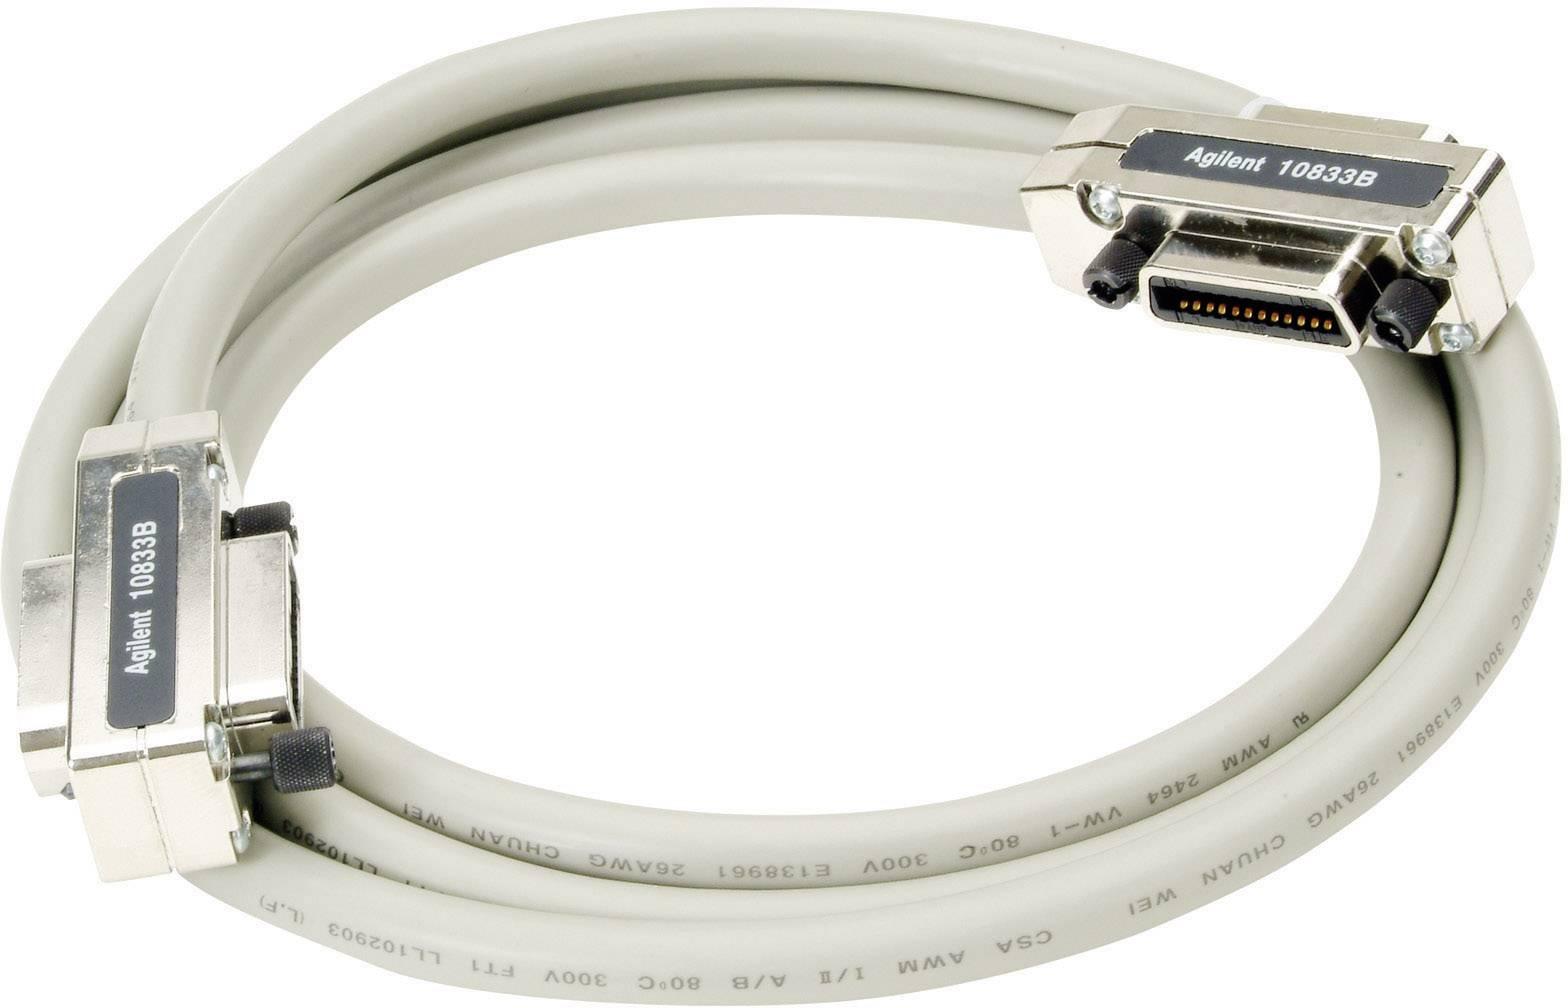 Kábel Agilent Technologies 10833D, 0.5 m